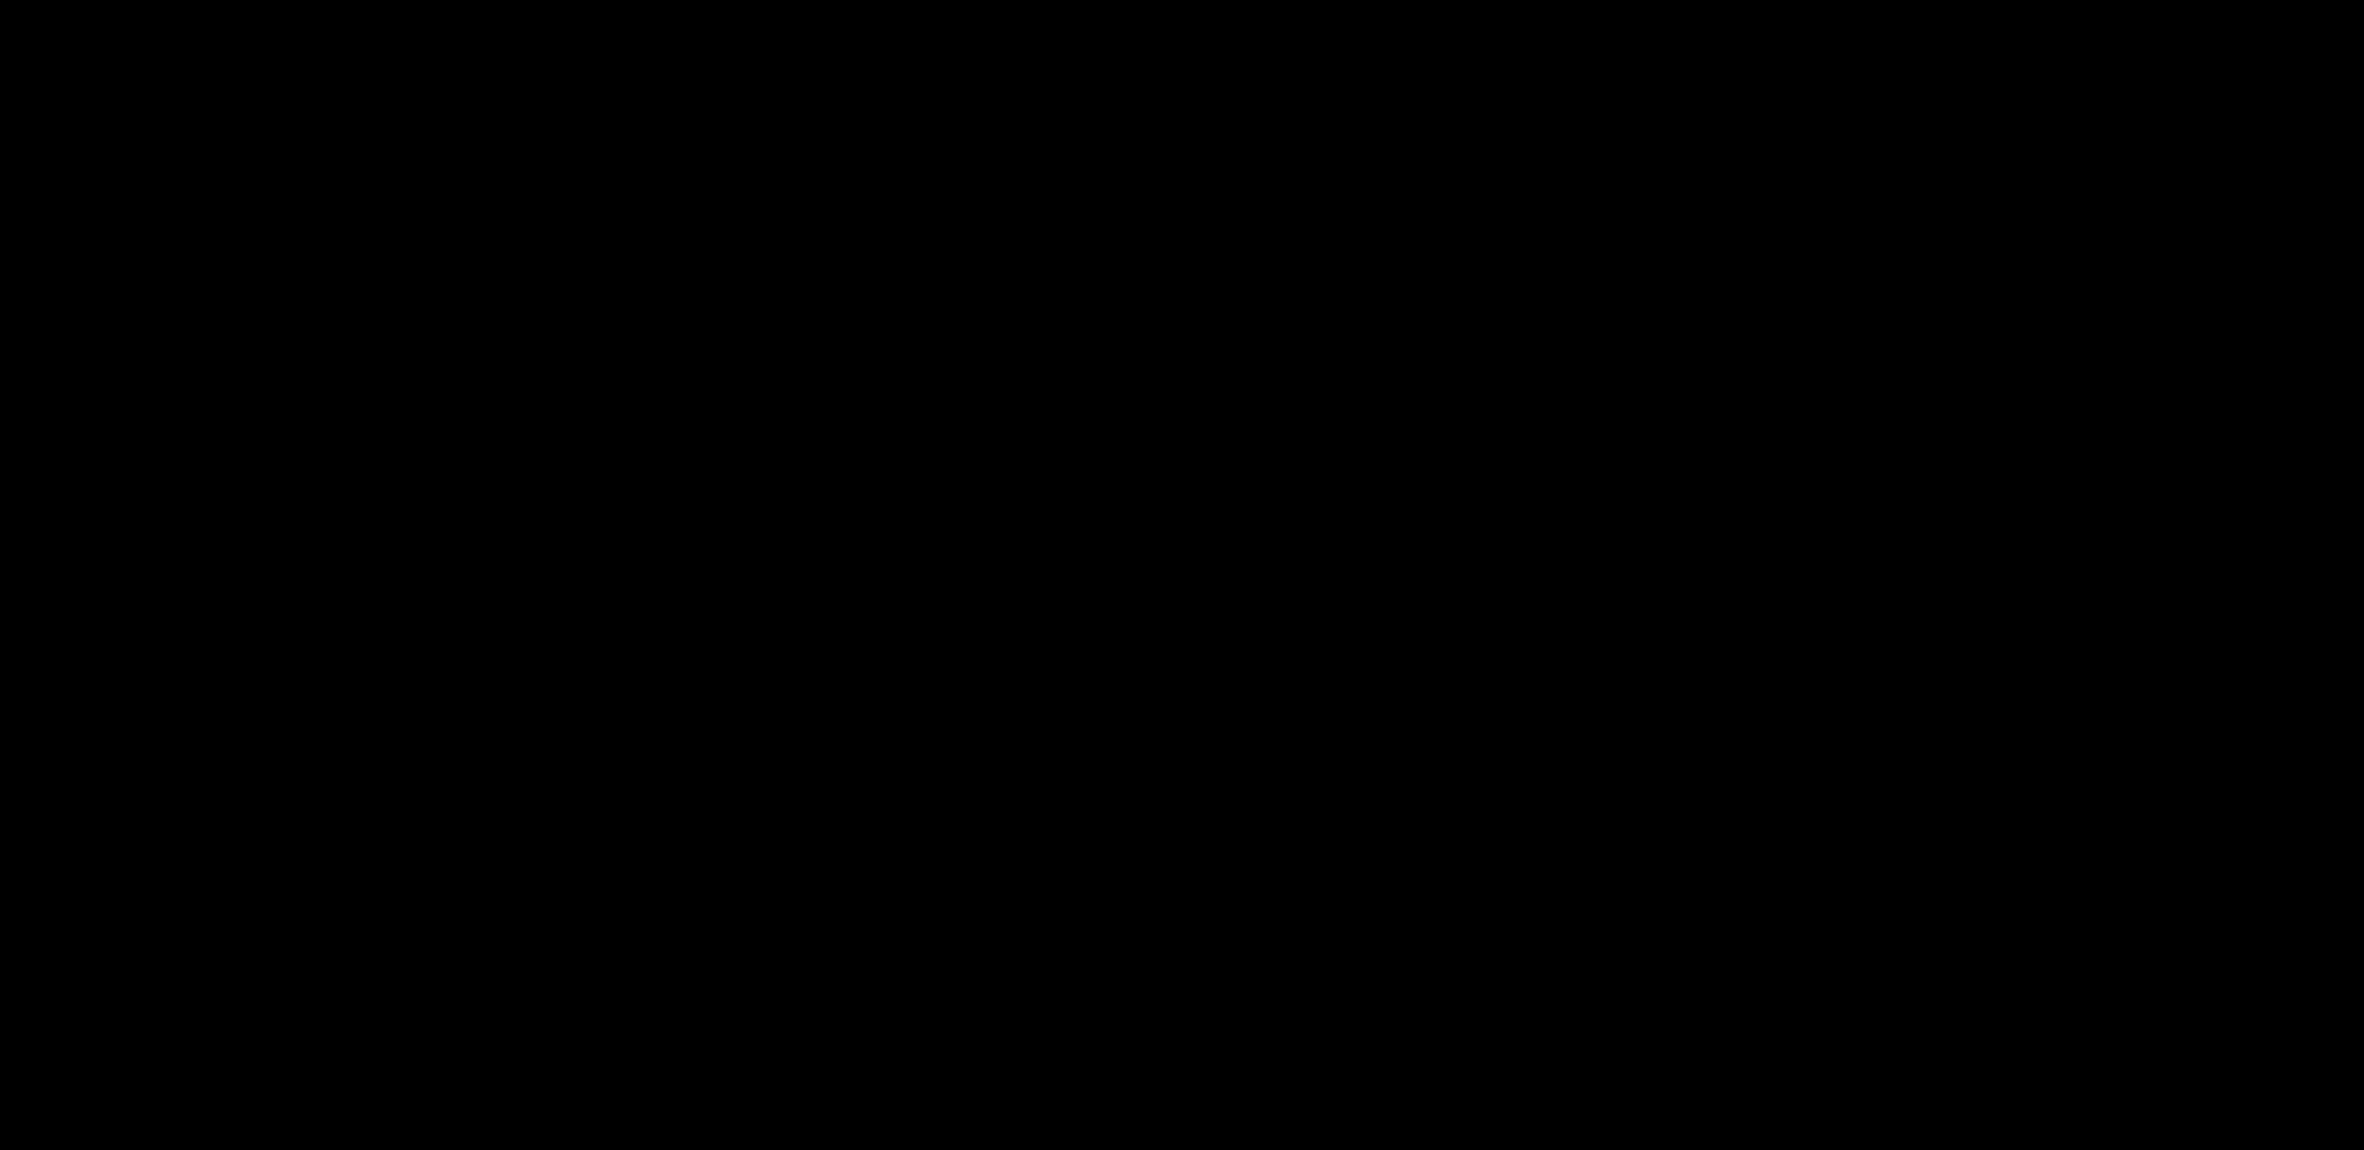 2364x1150 Bat Silhouette Clip Art